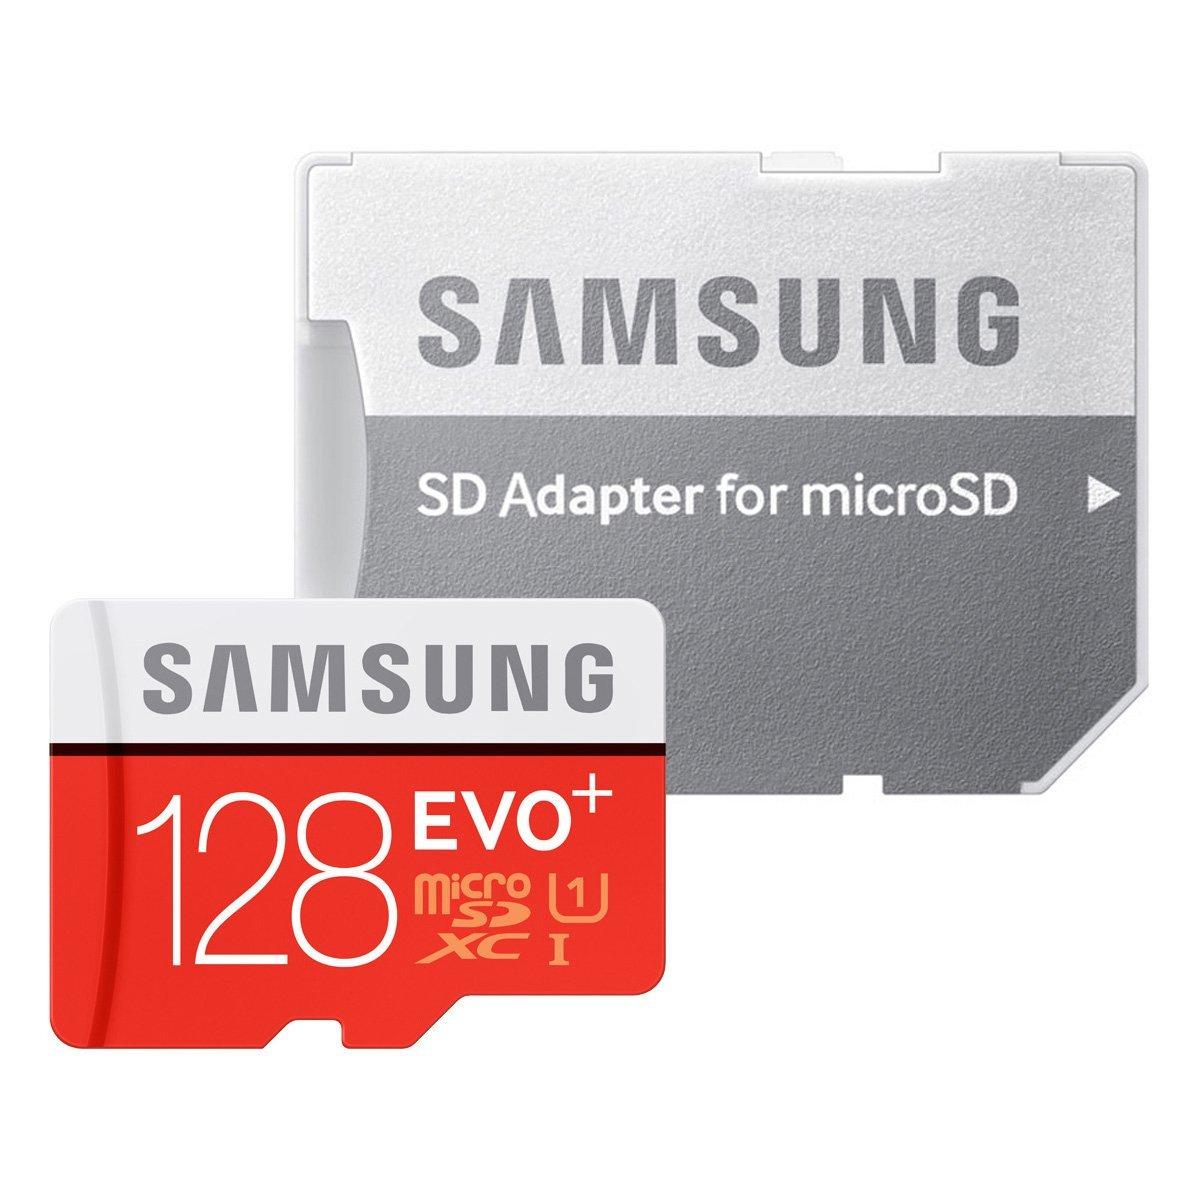 Samsung Memory Carte Mé moire 128 GB EVO Plus MicroSDXC UHS-I Grade 1 Classe 10 avec Adaptateur SD MB-MC128DAEU Carte mémoire Micro SD